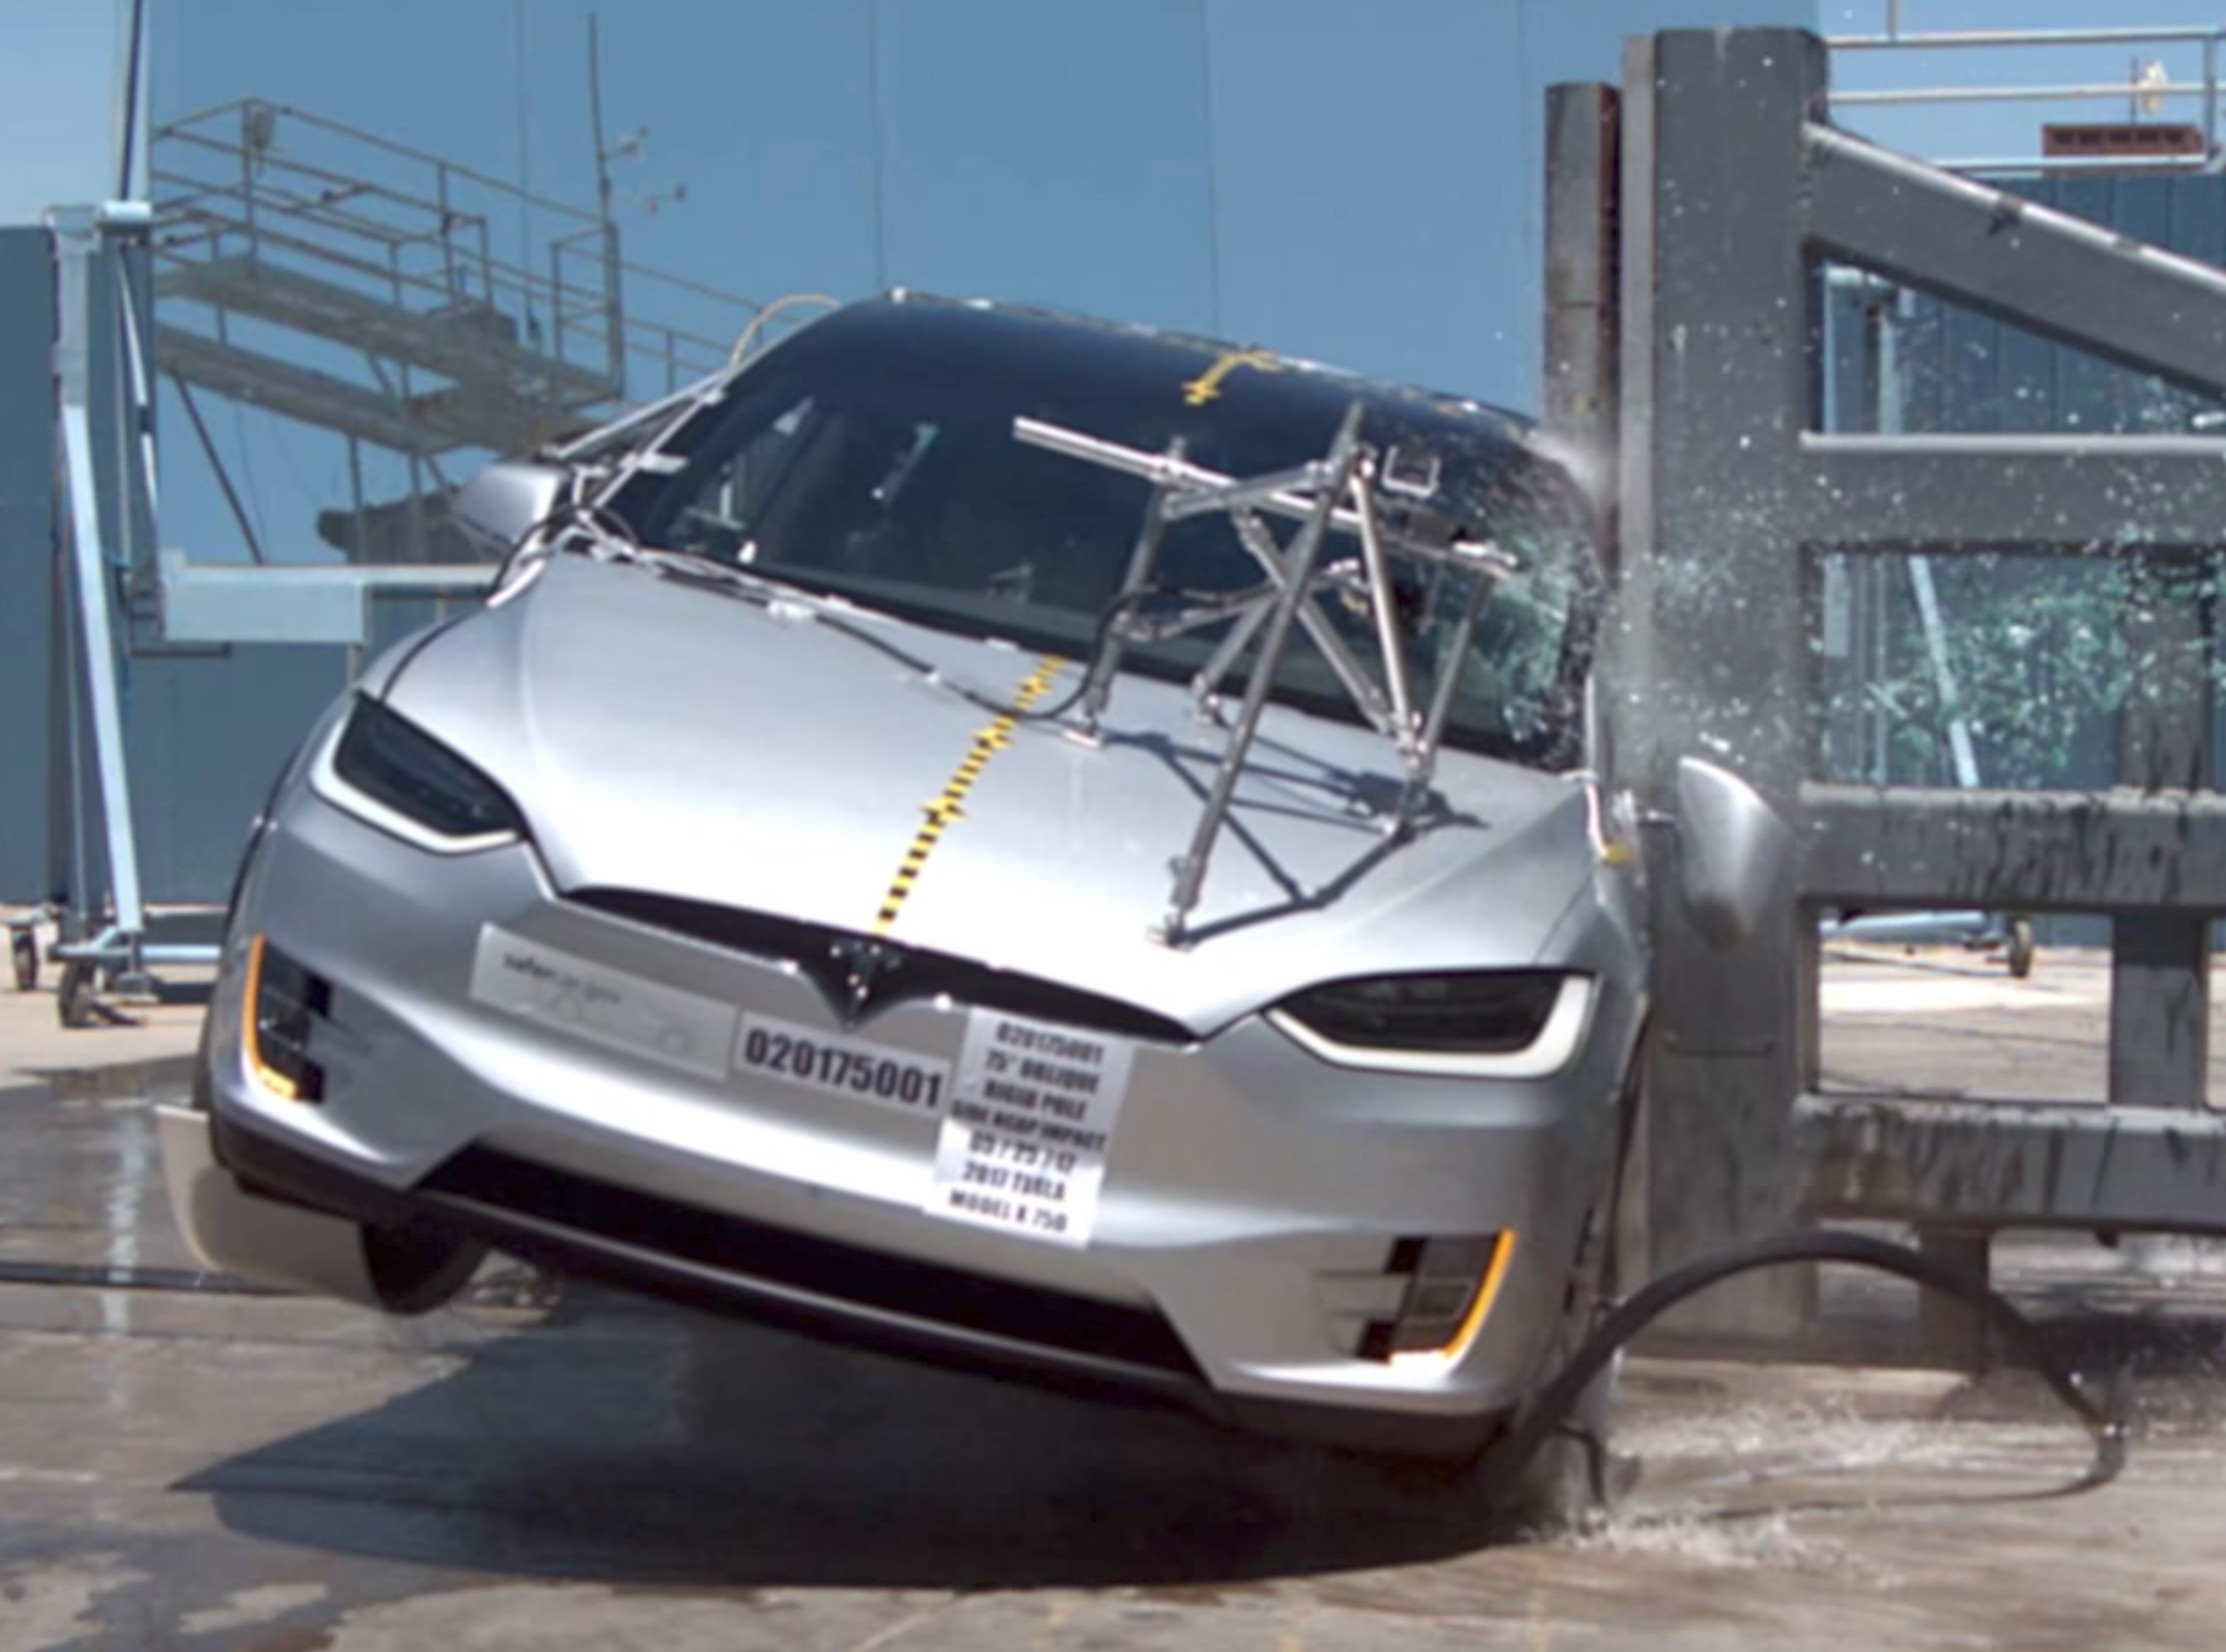 Nhtsa Tesla Model X Crash Test Videos Highlight Safety